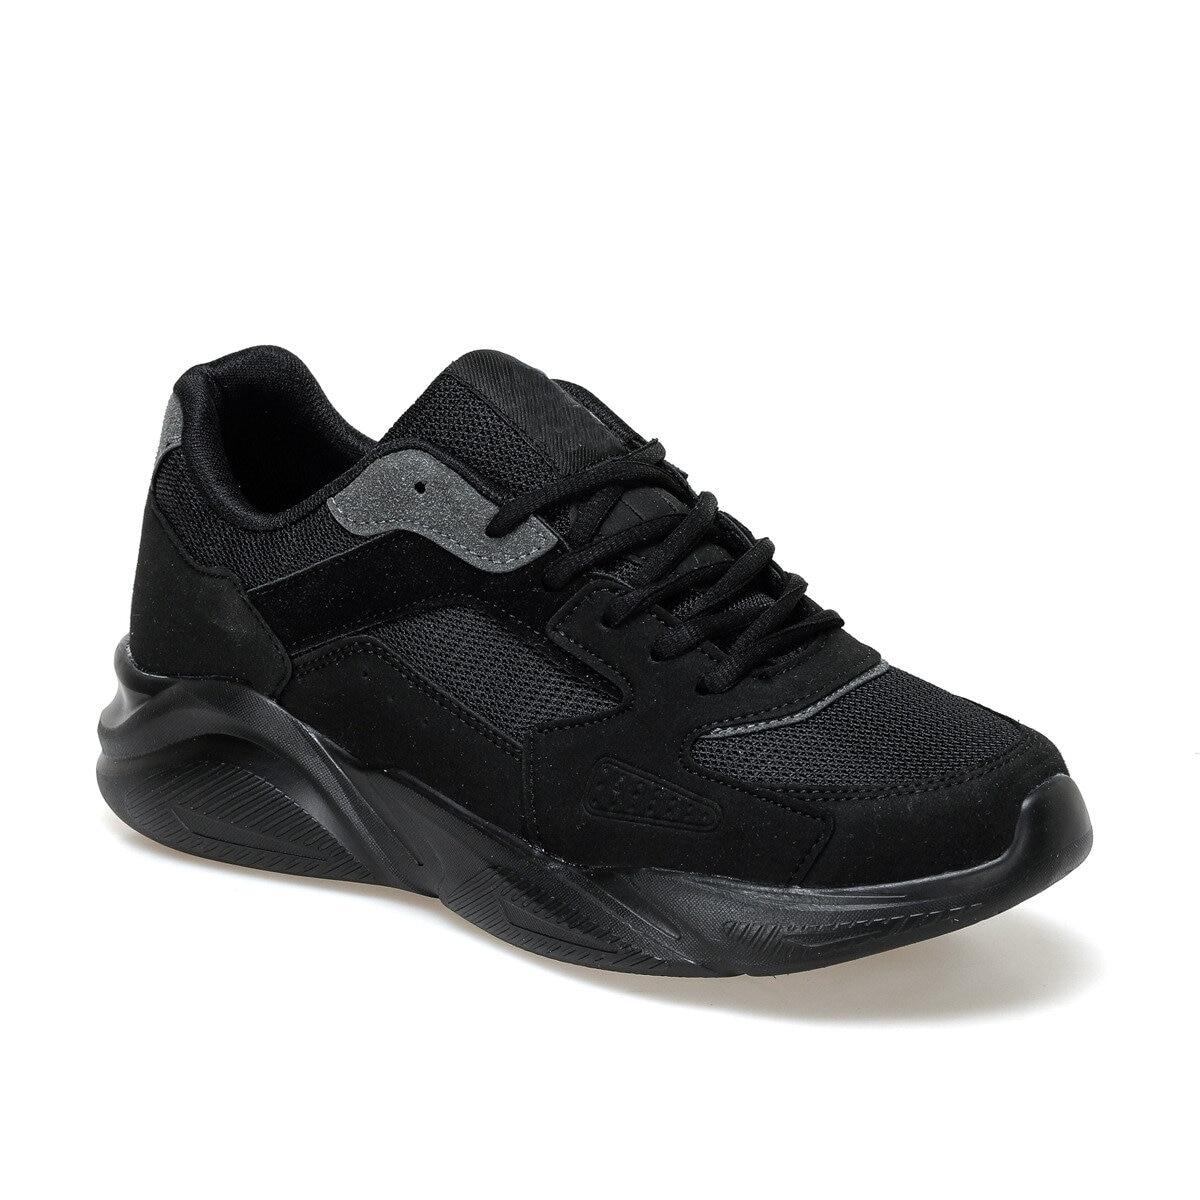 FLO EC-1121 Black Male Shoes Forester